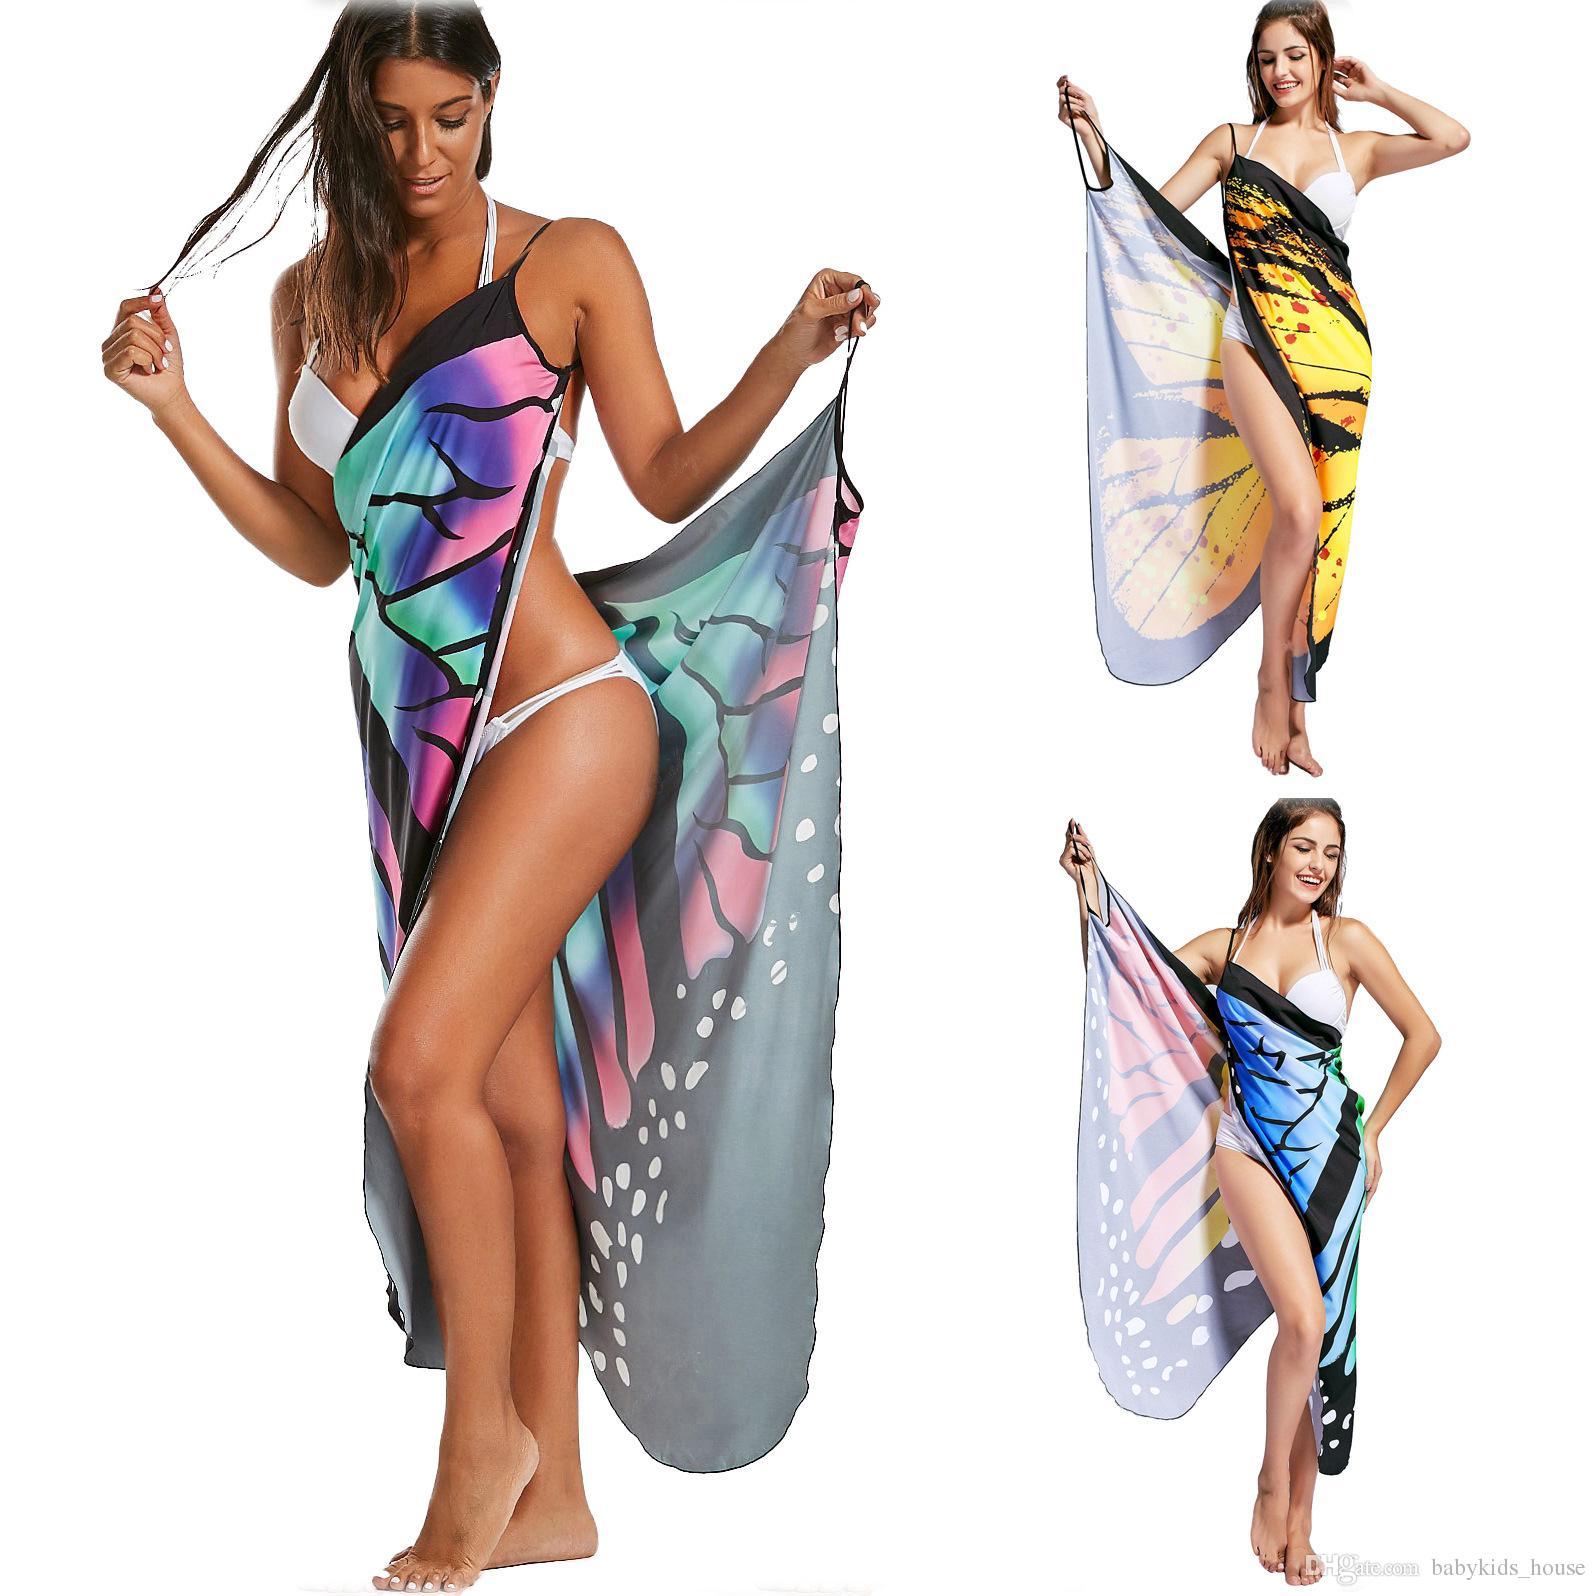 Empire Butterfly Print Dress Women Sexy Backless Beach Party Dresses Summer Mori Girl Boho Chic Bodycon Dress Beach Wear Maternity Dress